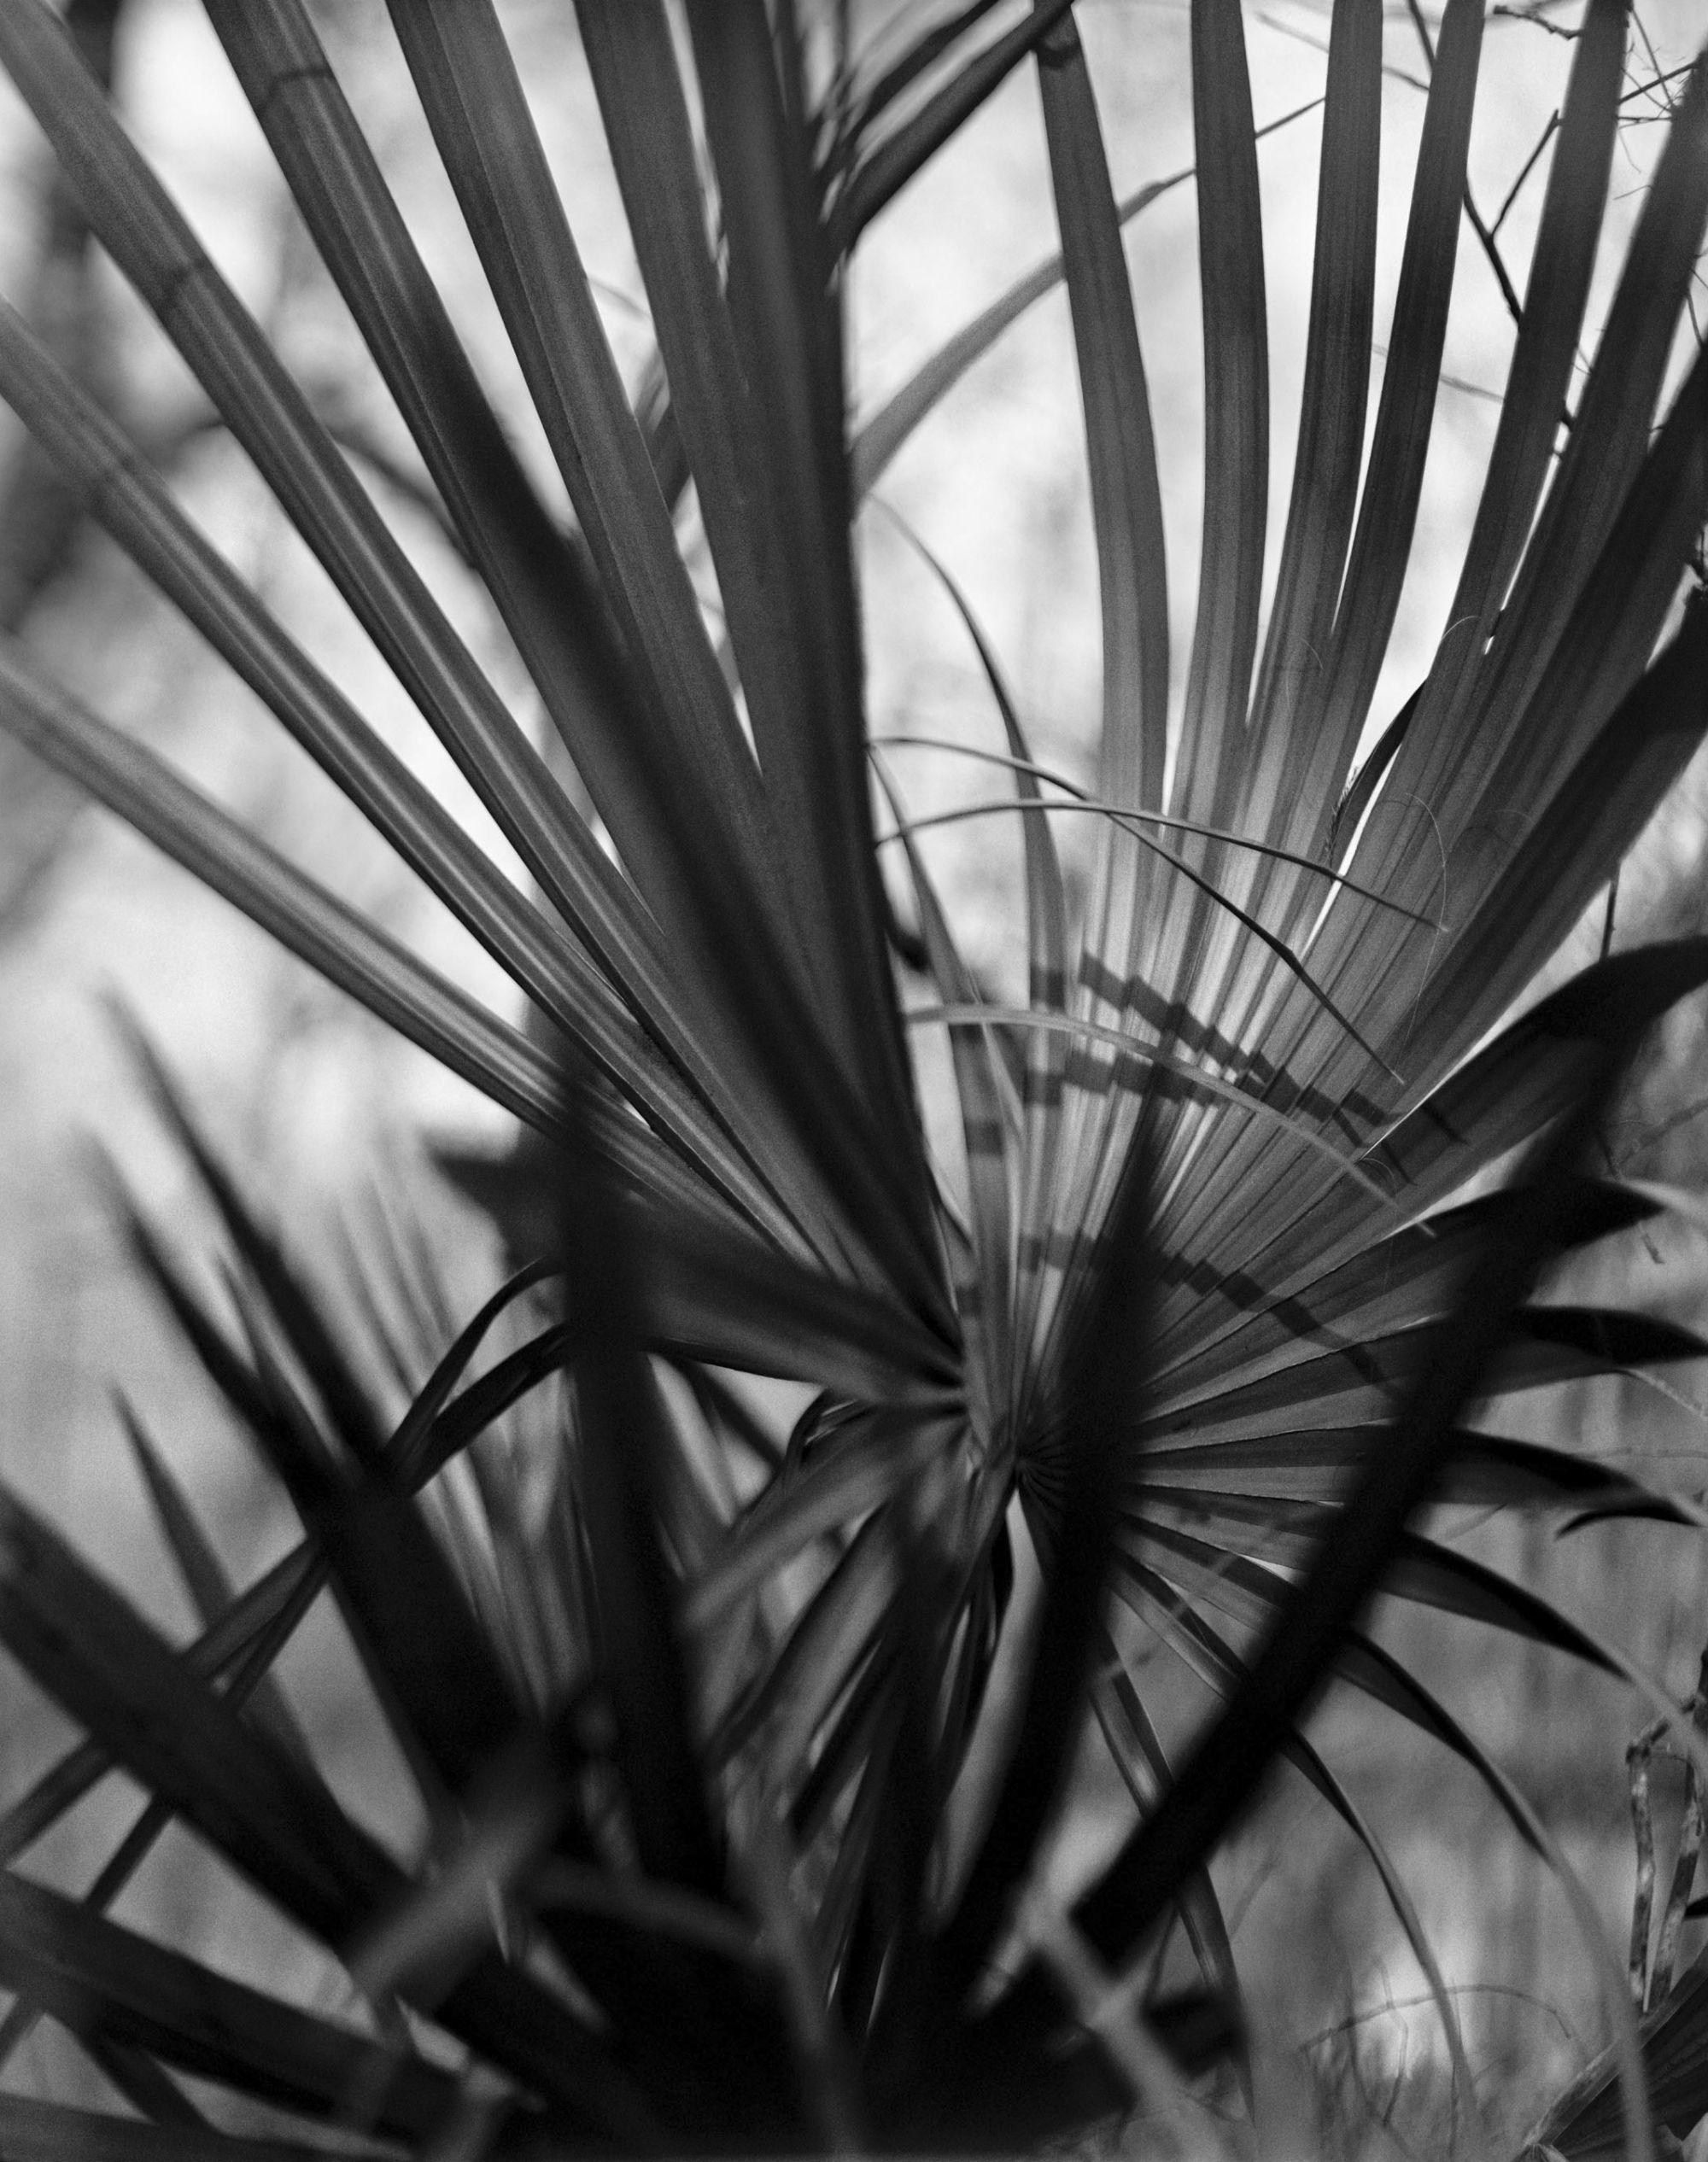 slip touch (palm)